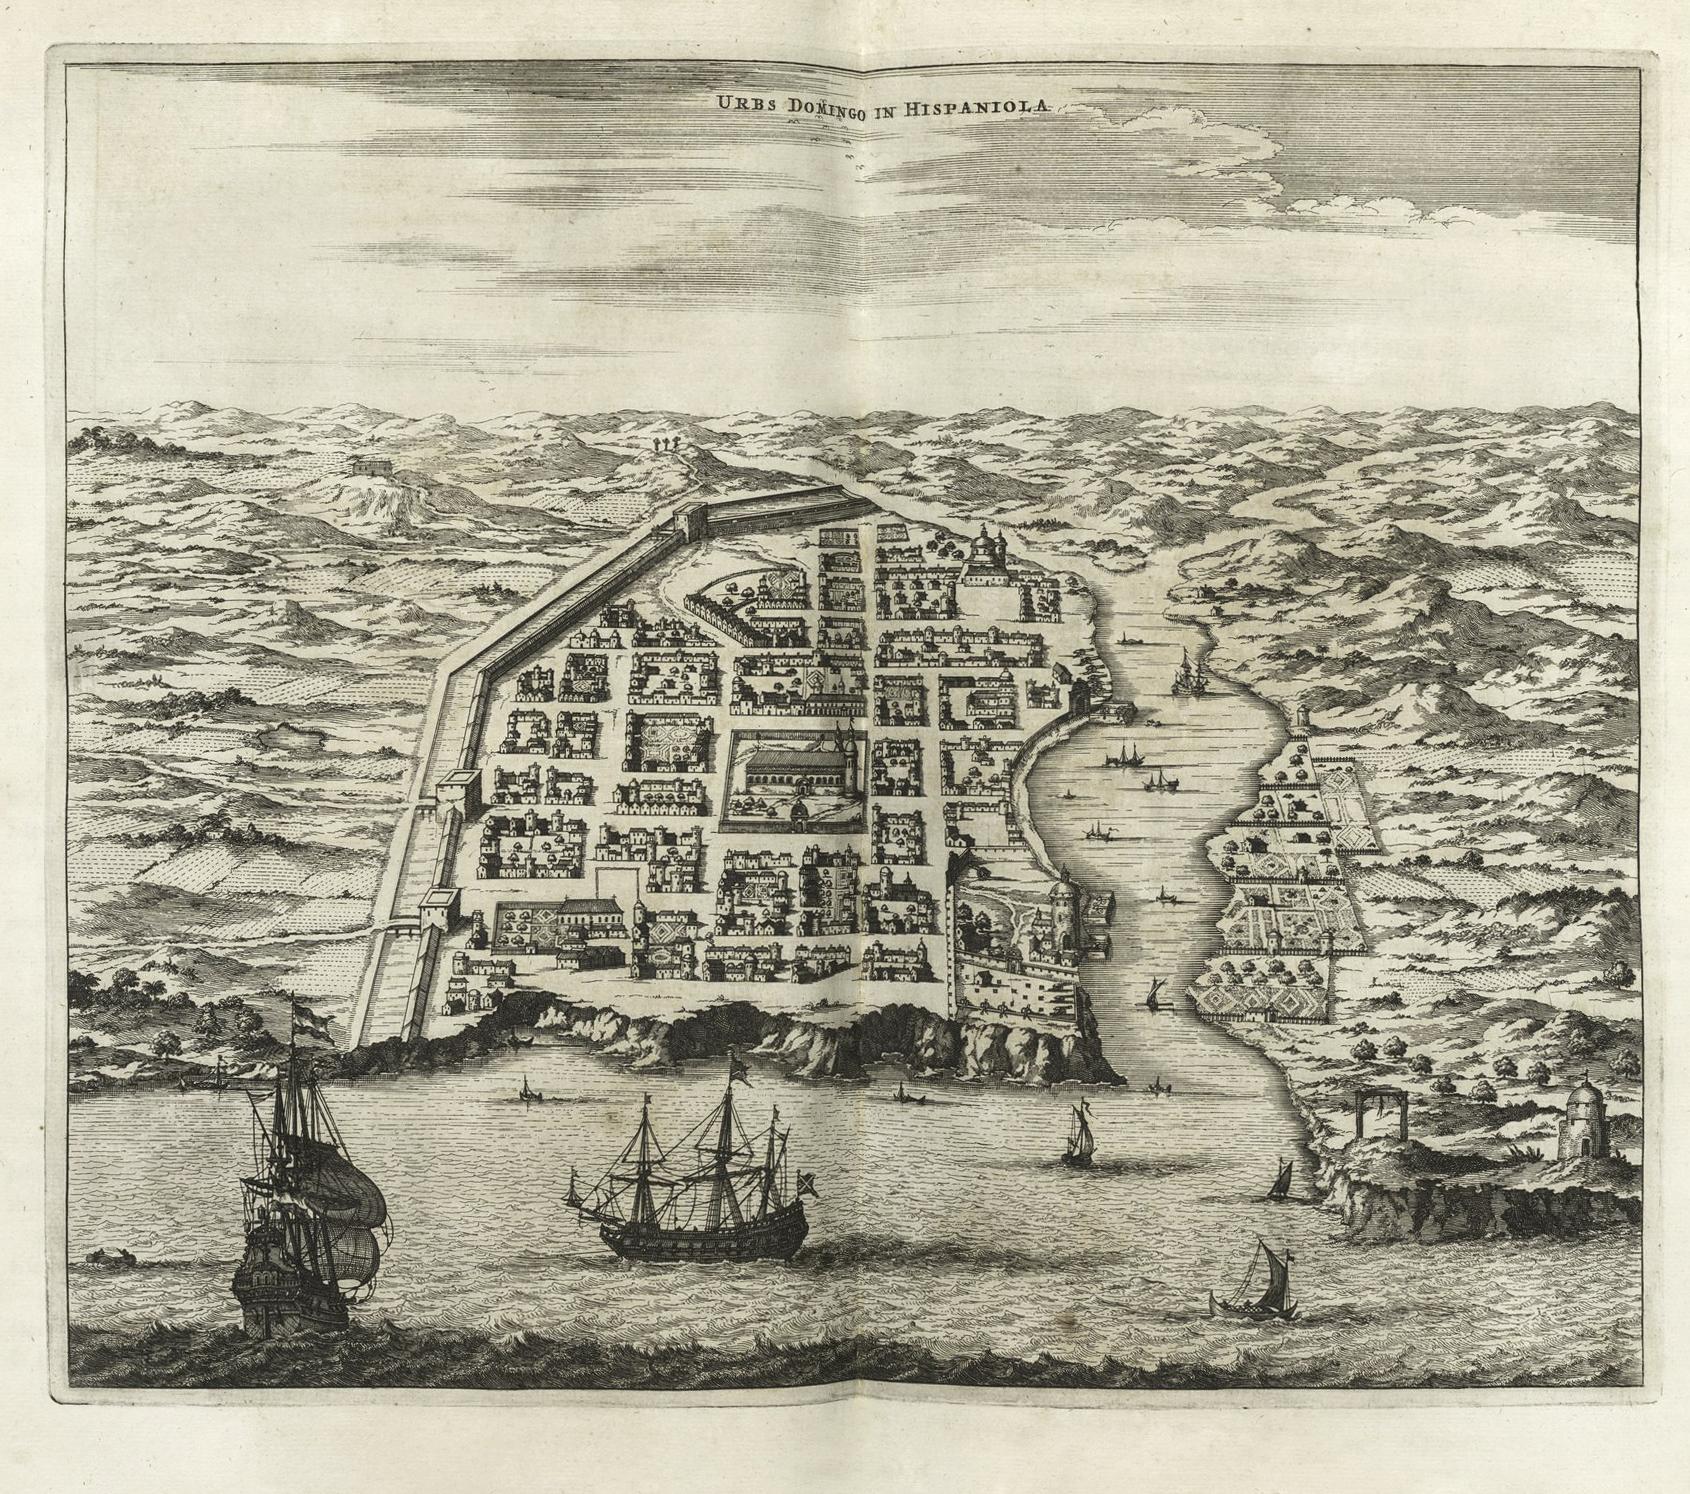 FileUrbs Domingo in Hispaniola Montanus 1671jpg Wikimedia